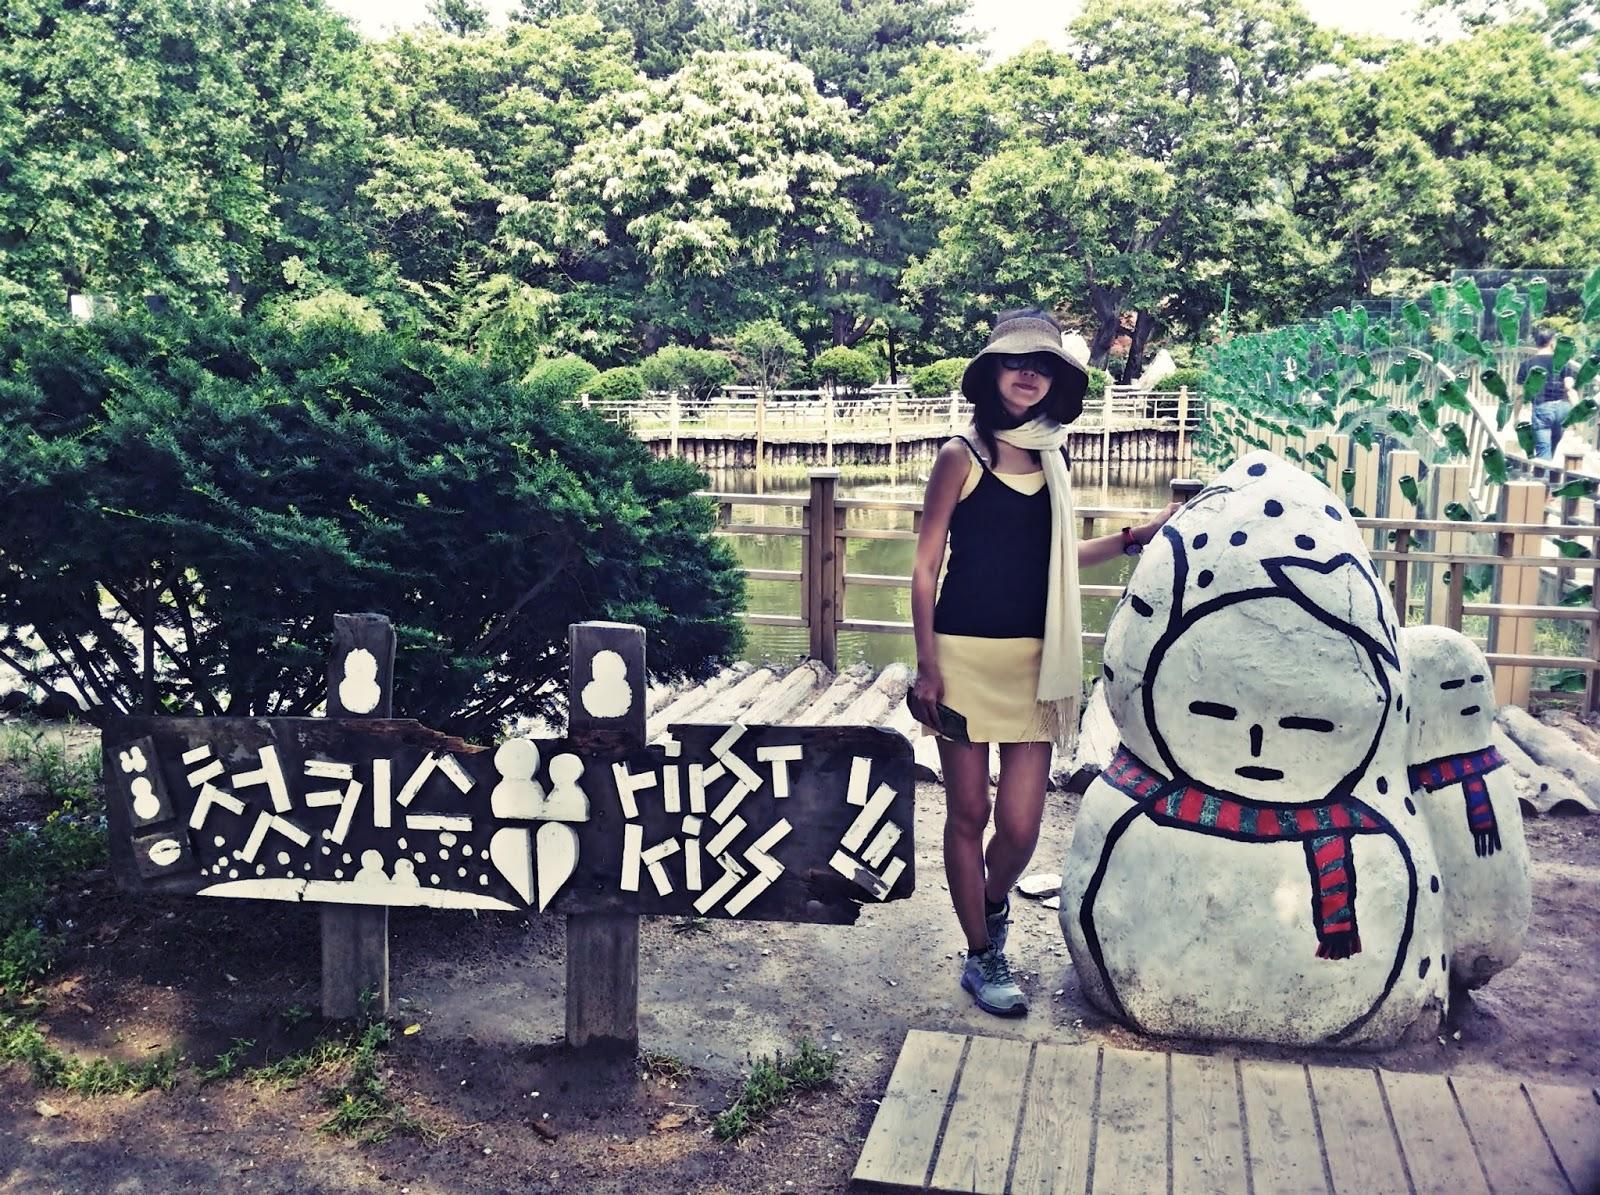 [Namiseon Island] K-drama Winter Sonata | meheartsoul.blogspot.com